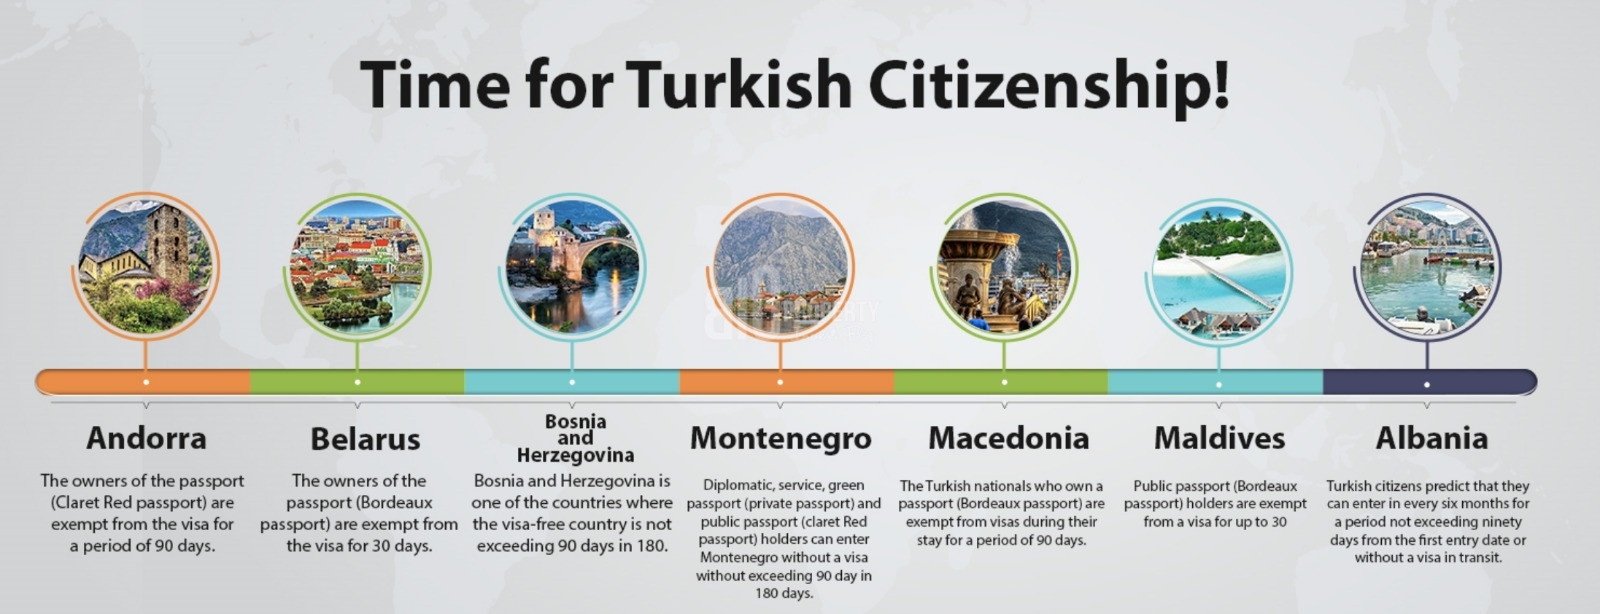 turkish citizenship passport advantage